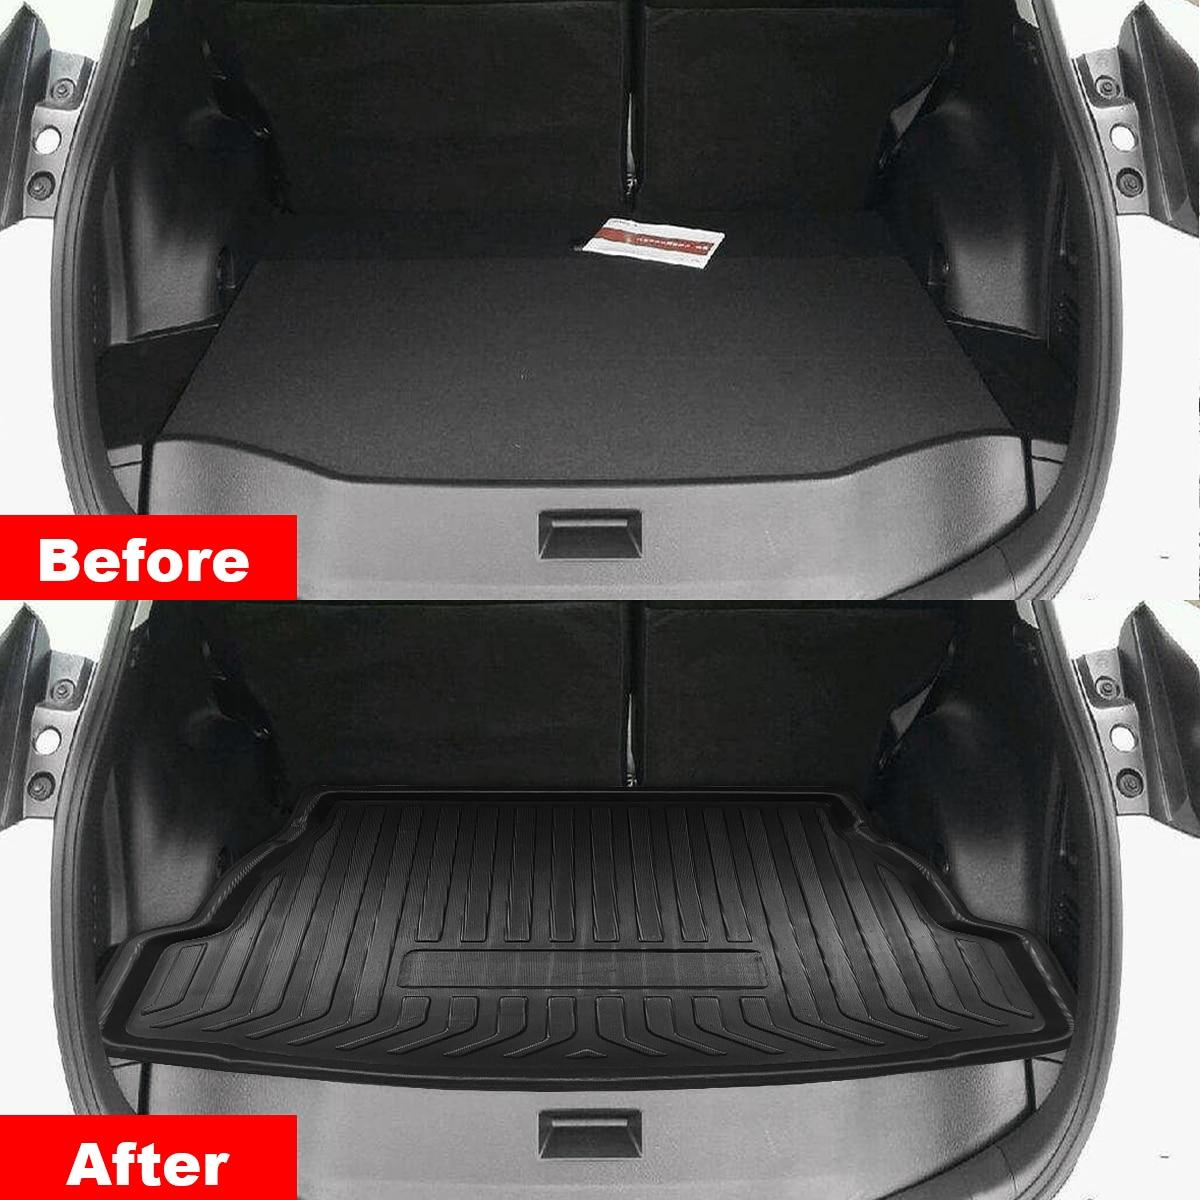 Nuevo forro Interior de maletero para coche, bandeja de maletero para cubierta de maletero, alfombrilla mate, alfombrilla para suelo, alfombrilla para Patadas para Toyota RAV4 2019 2020